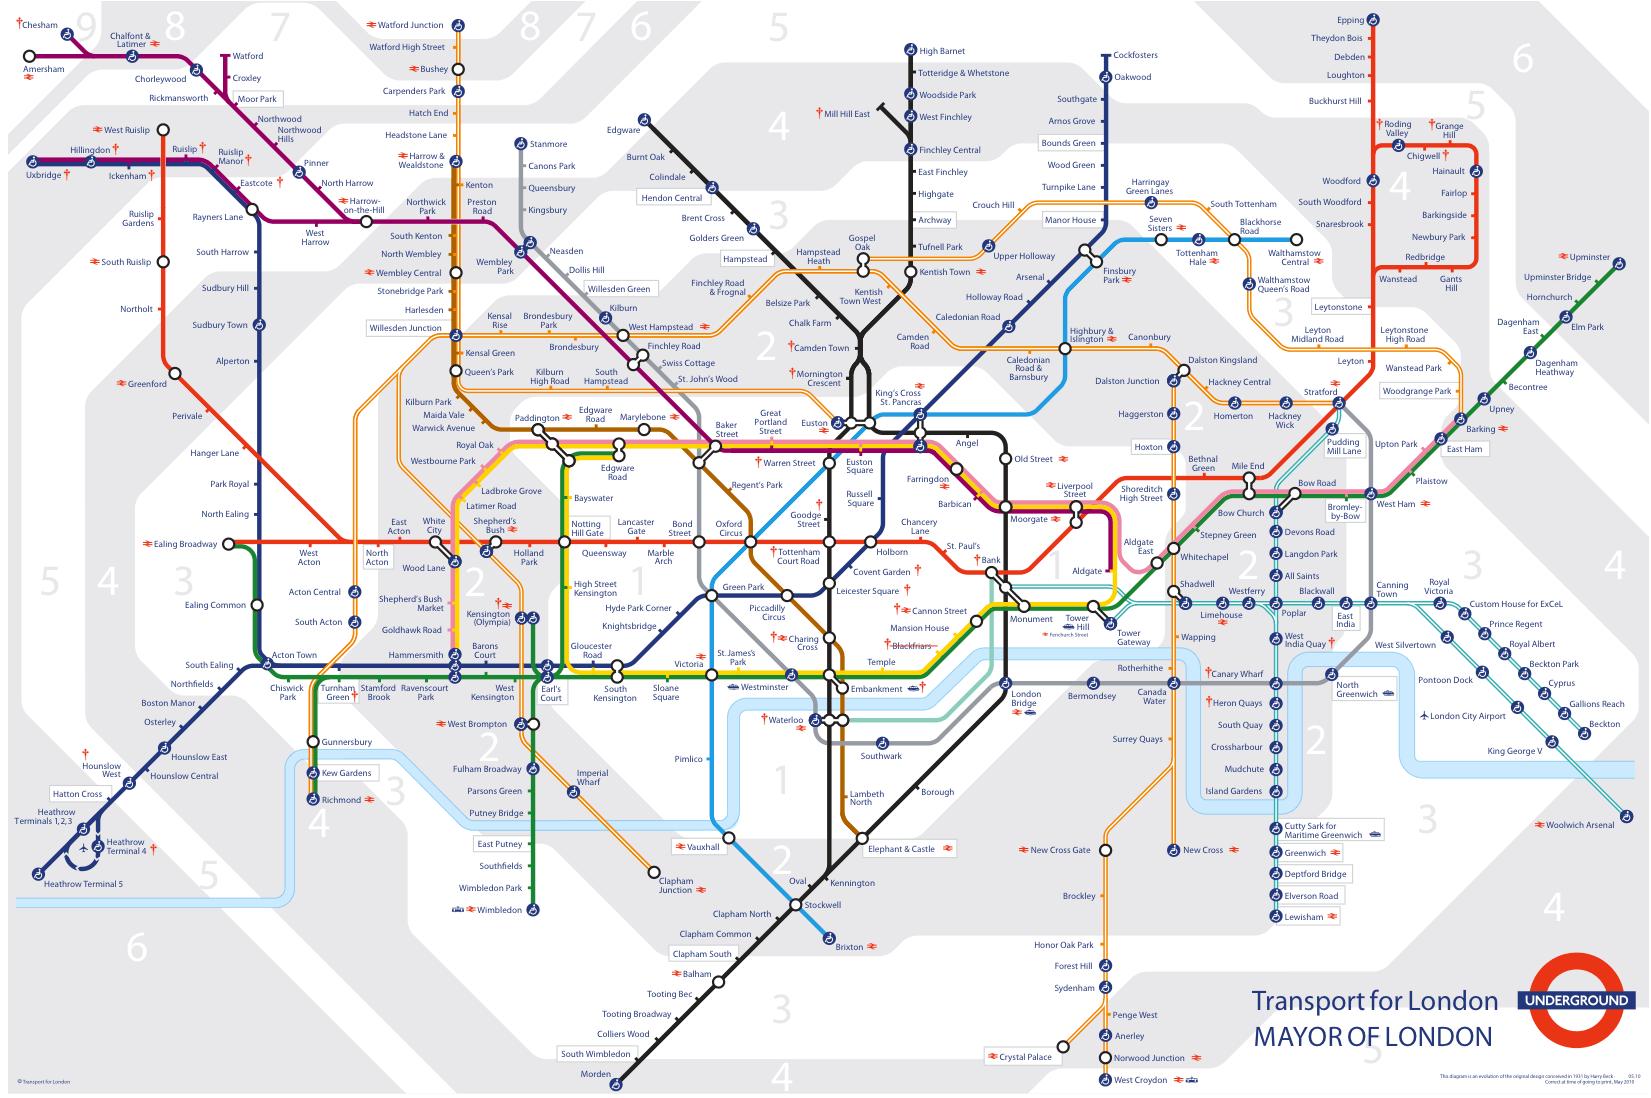 Zone 1 6 Map Bricoleurbanism » Shanghai's Metro and London's Tube Head to Head Zone 1 6 Map